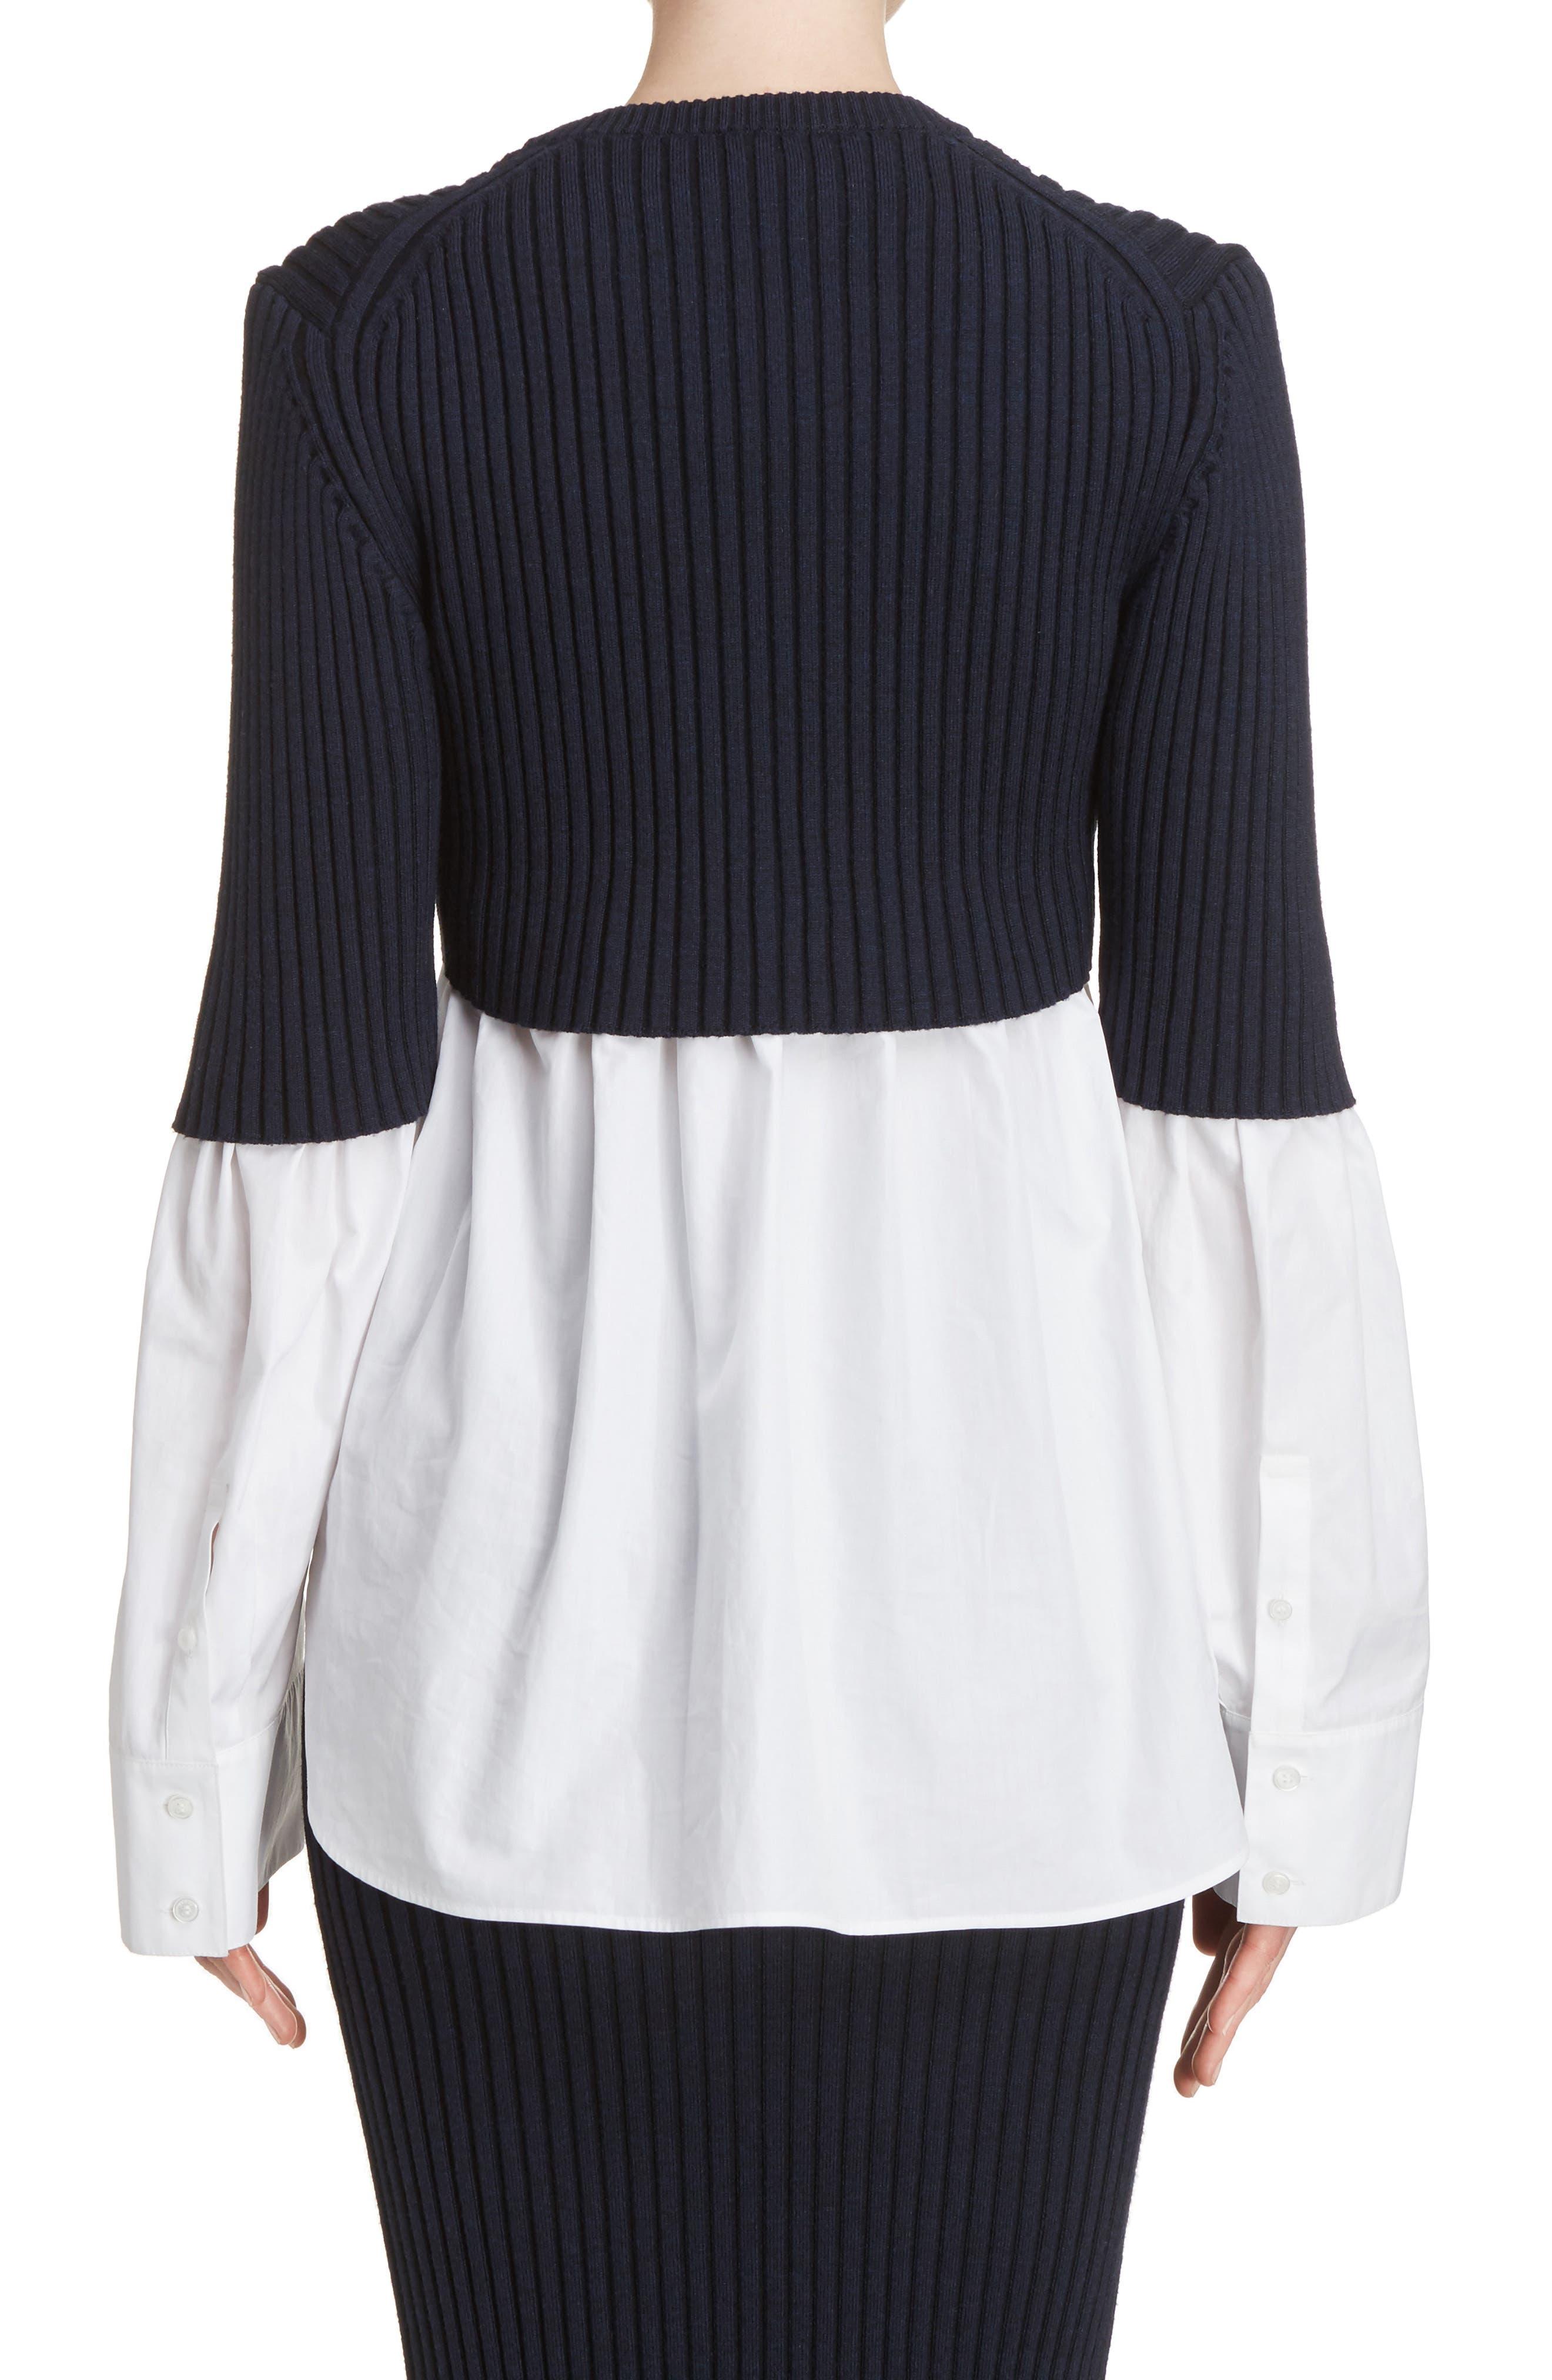 Alternate Image 3  - KENZO Knit Overlay Cotton Blouse